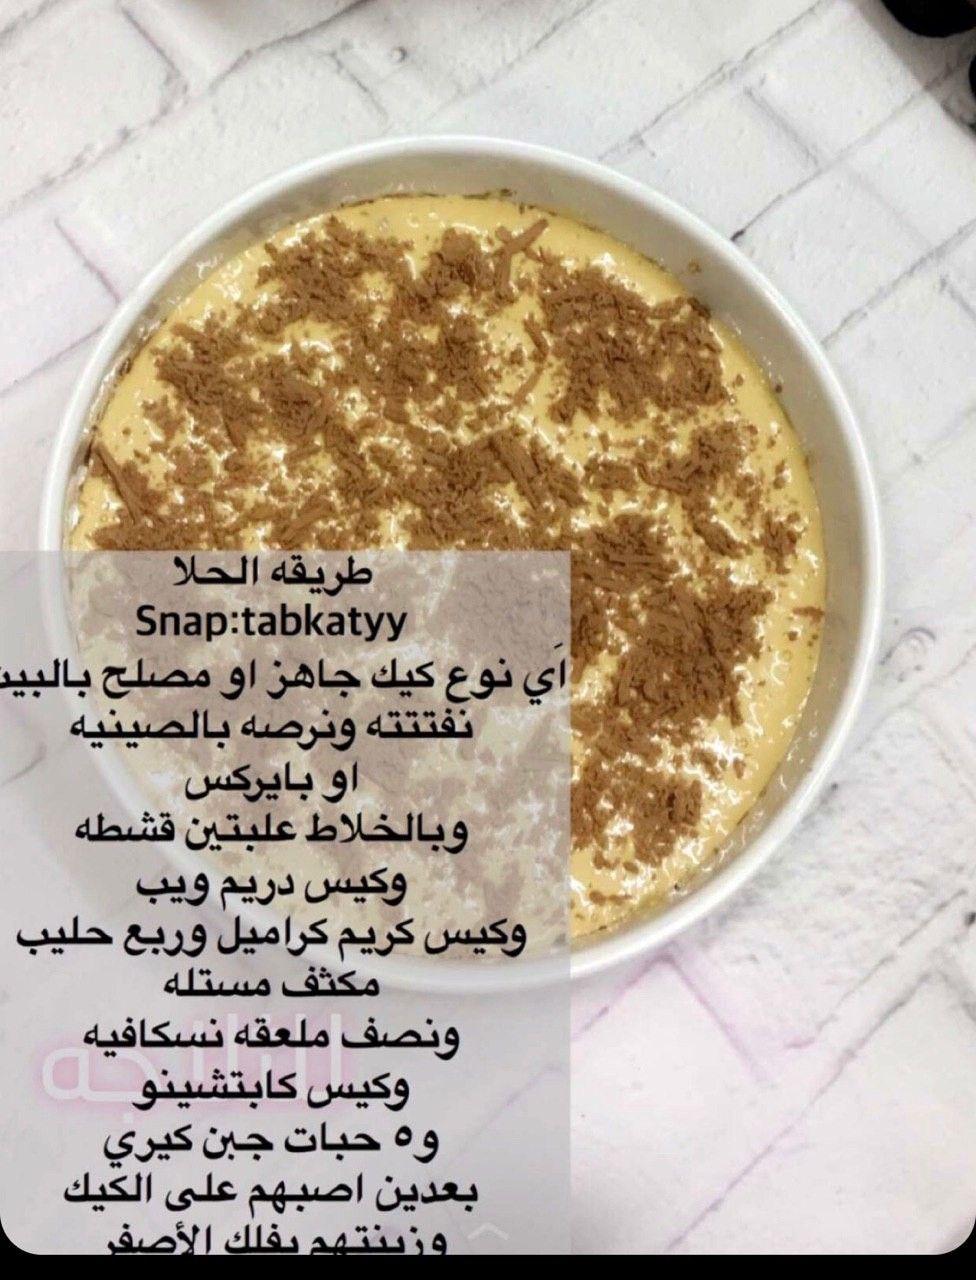 Pin By Soso On وصفات حلى صينية Recipes Cooking Recipes Arabic Food